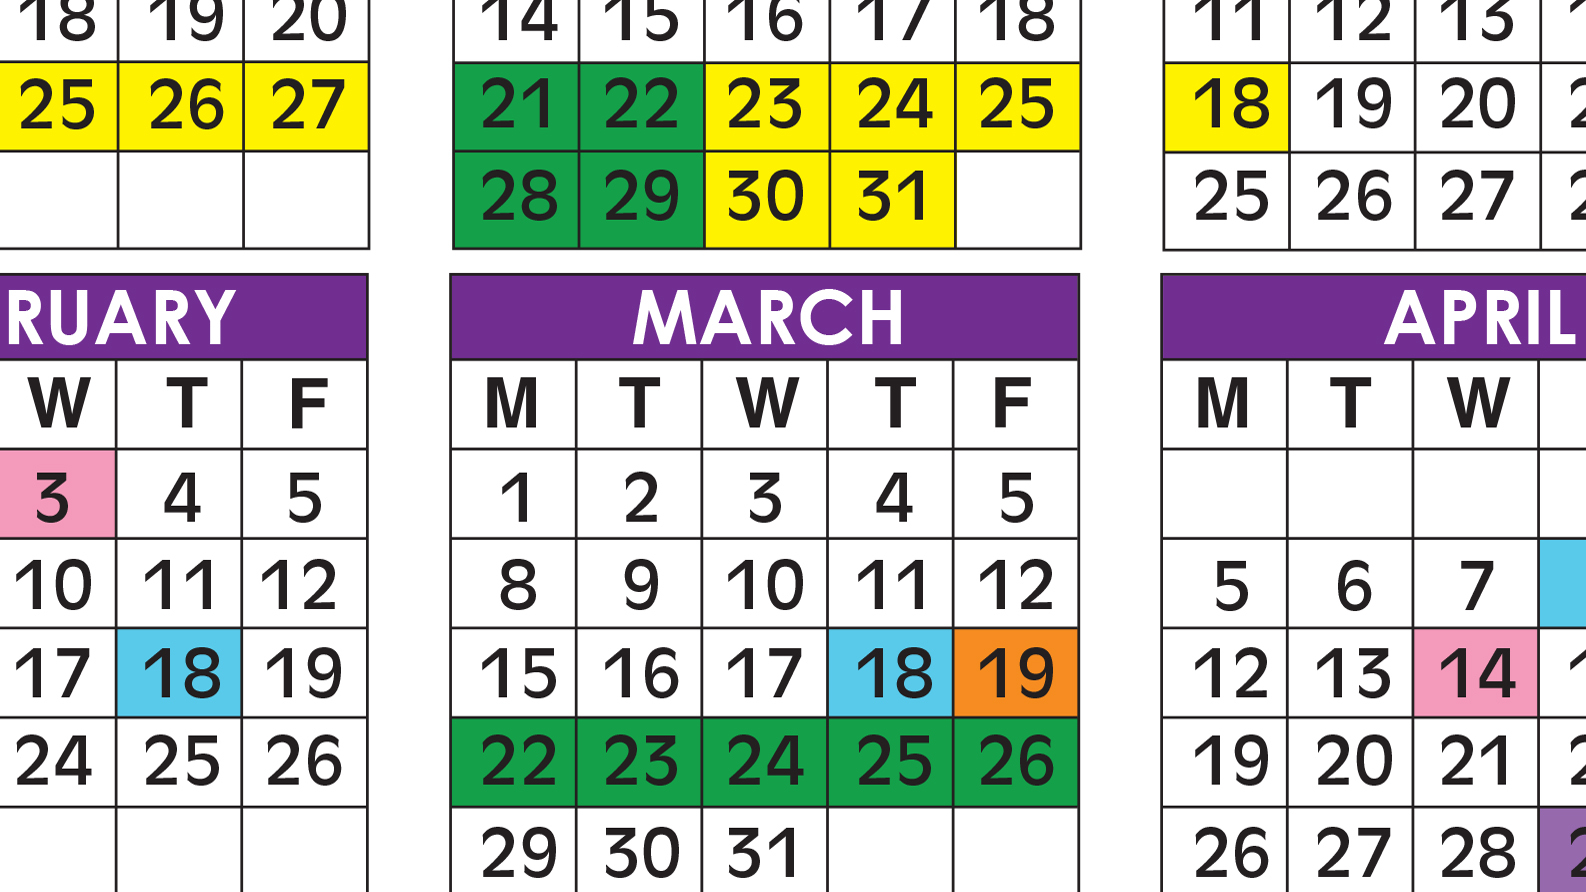 Official 2020/21 Broward County Public Schools Color Throughout Port St Lucie School District Calendar